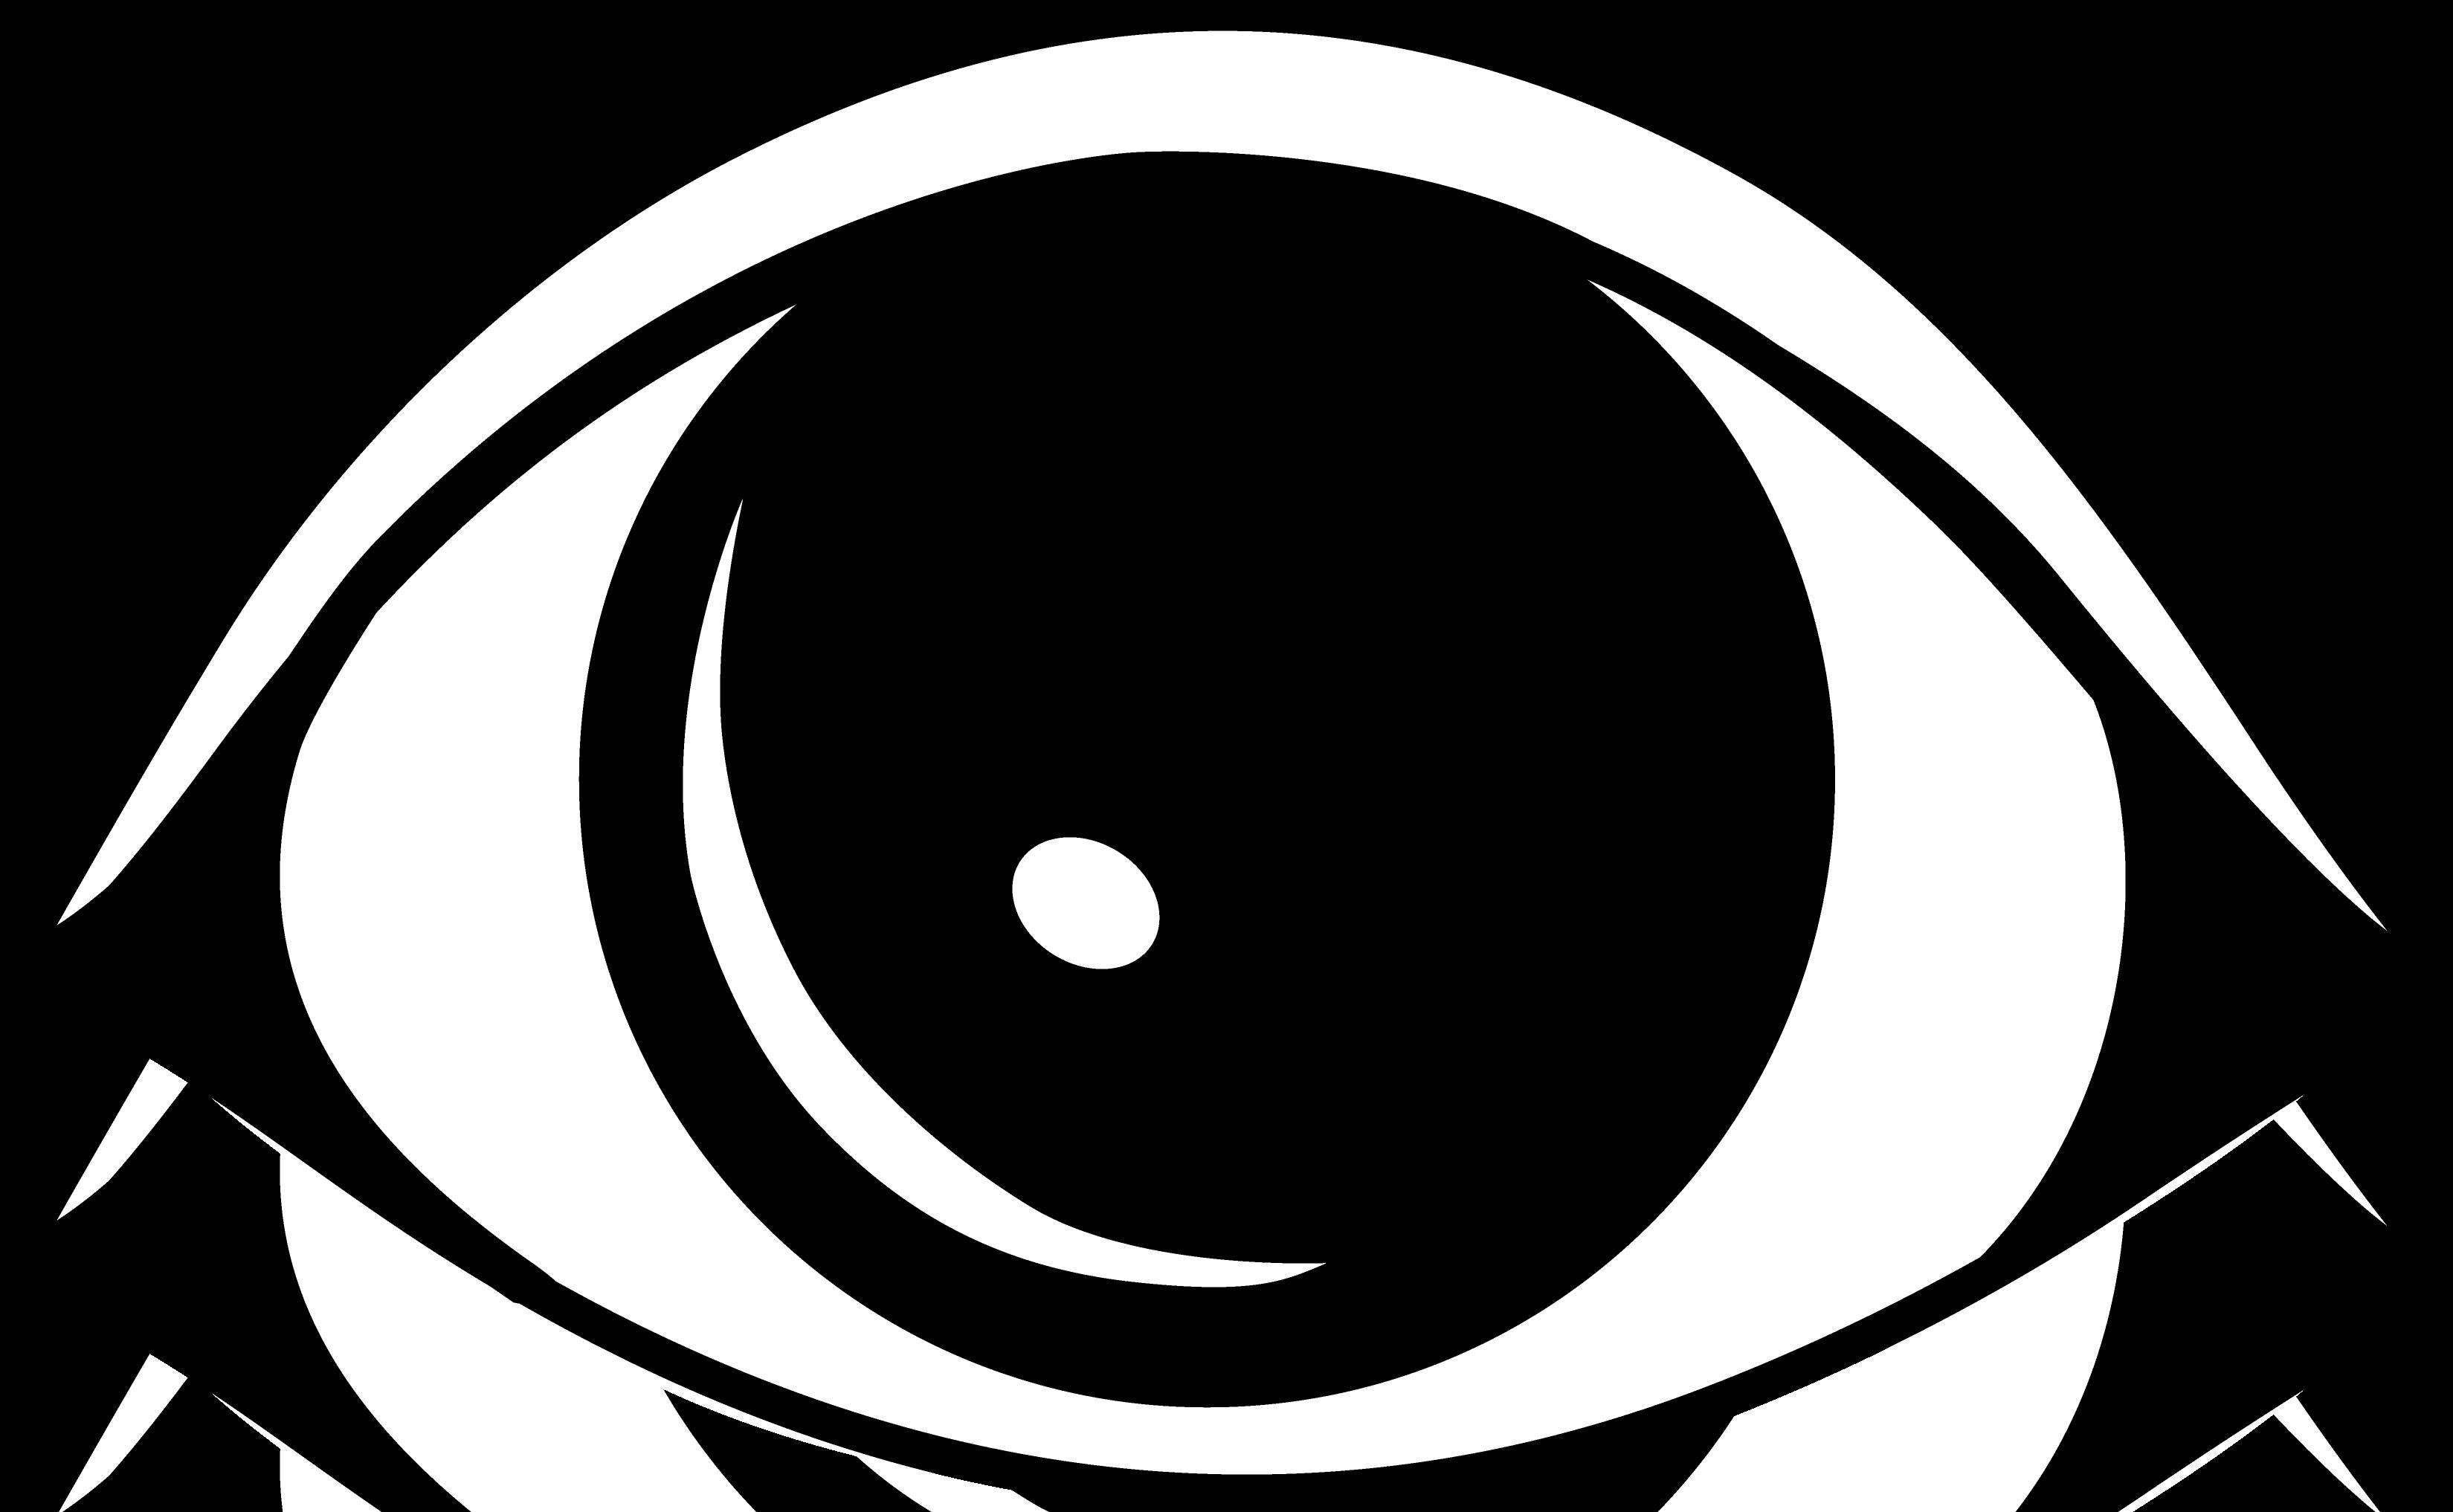 Free Black Eye Cartoon, Download Free Clip Art, Free Clip.